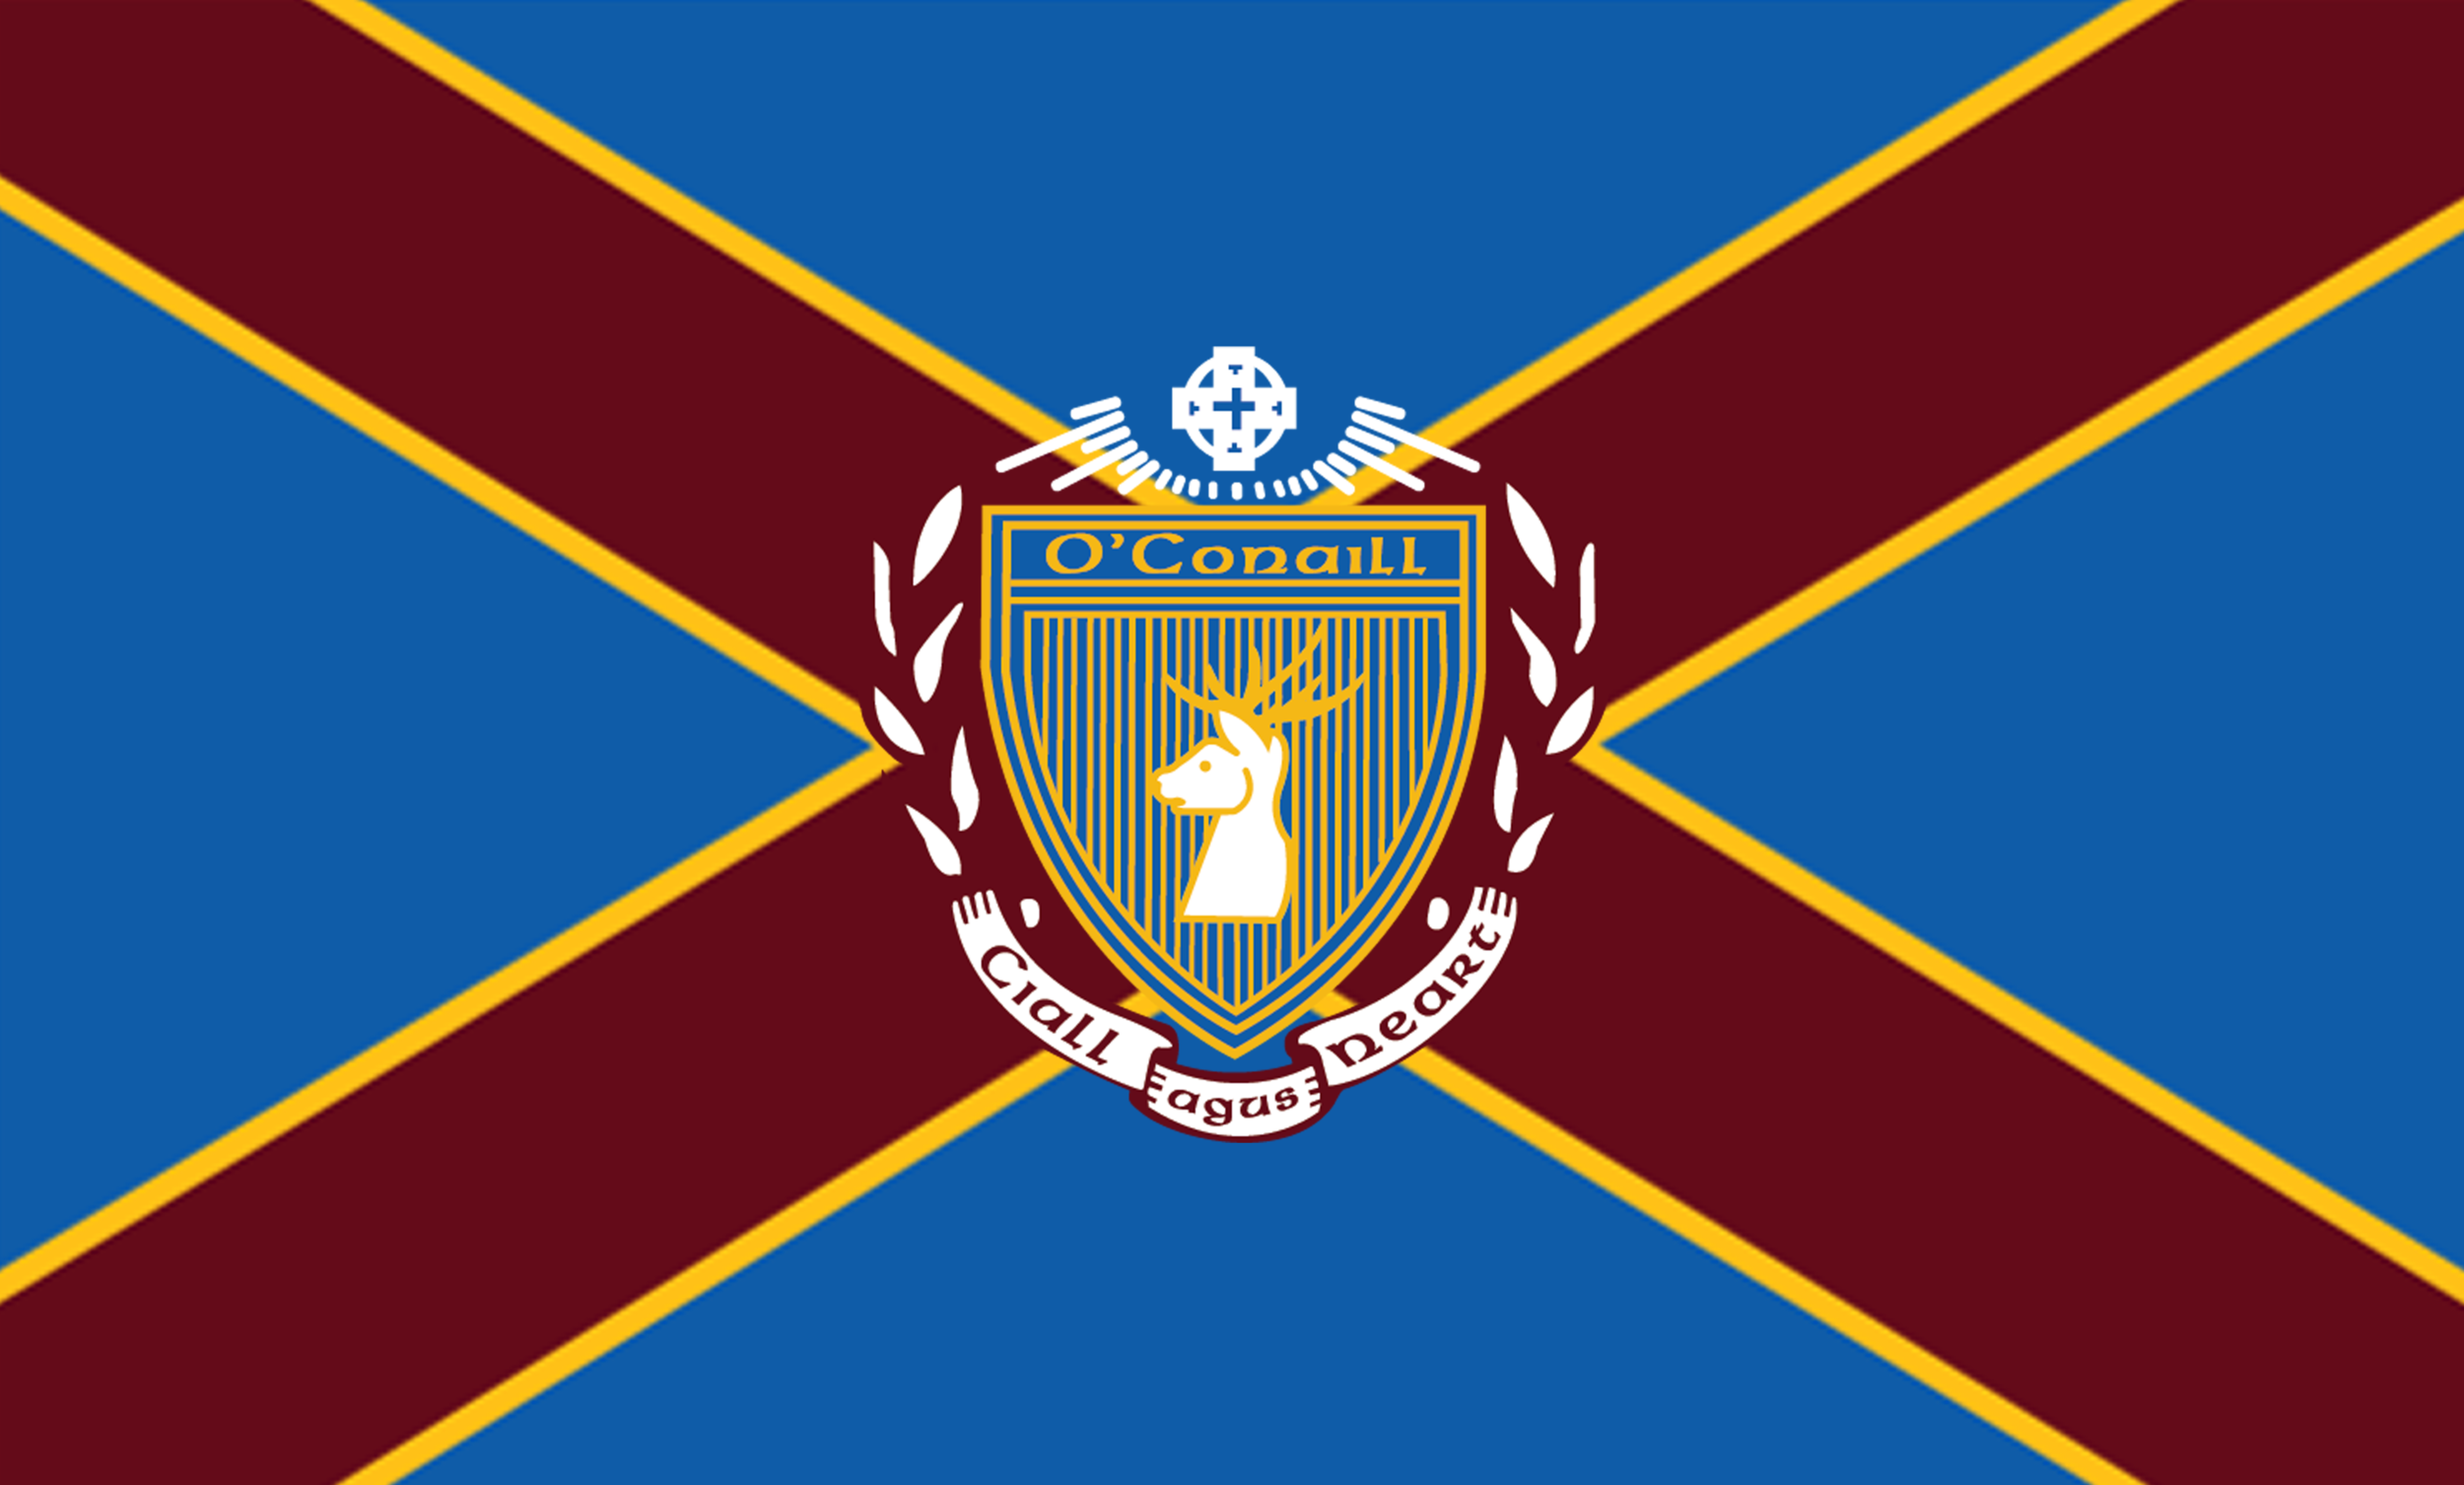 Scoil Scotland flag_crest_white lines.png